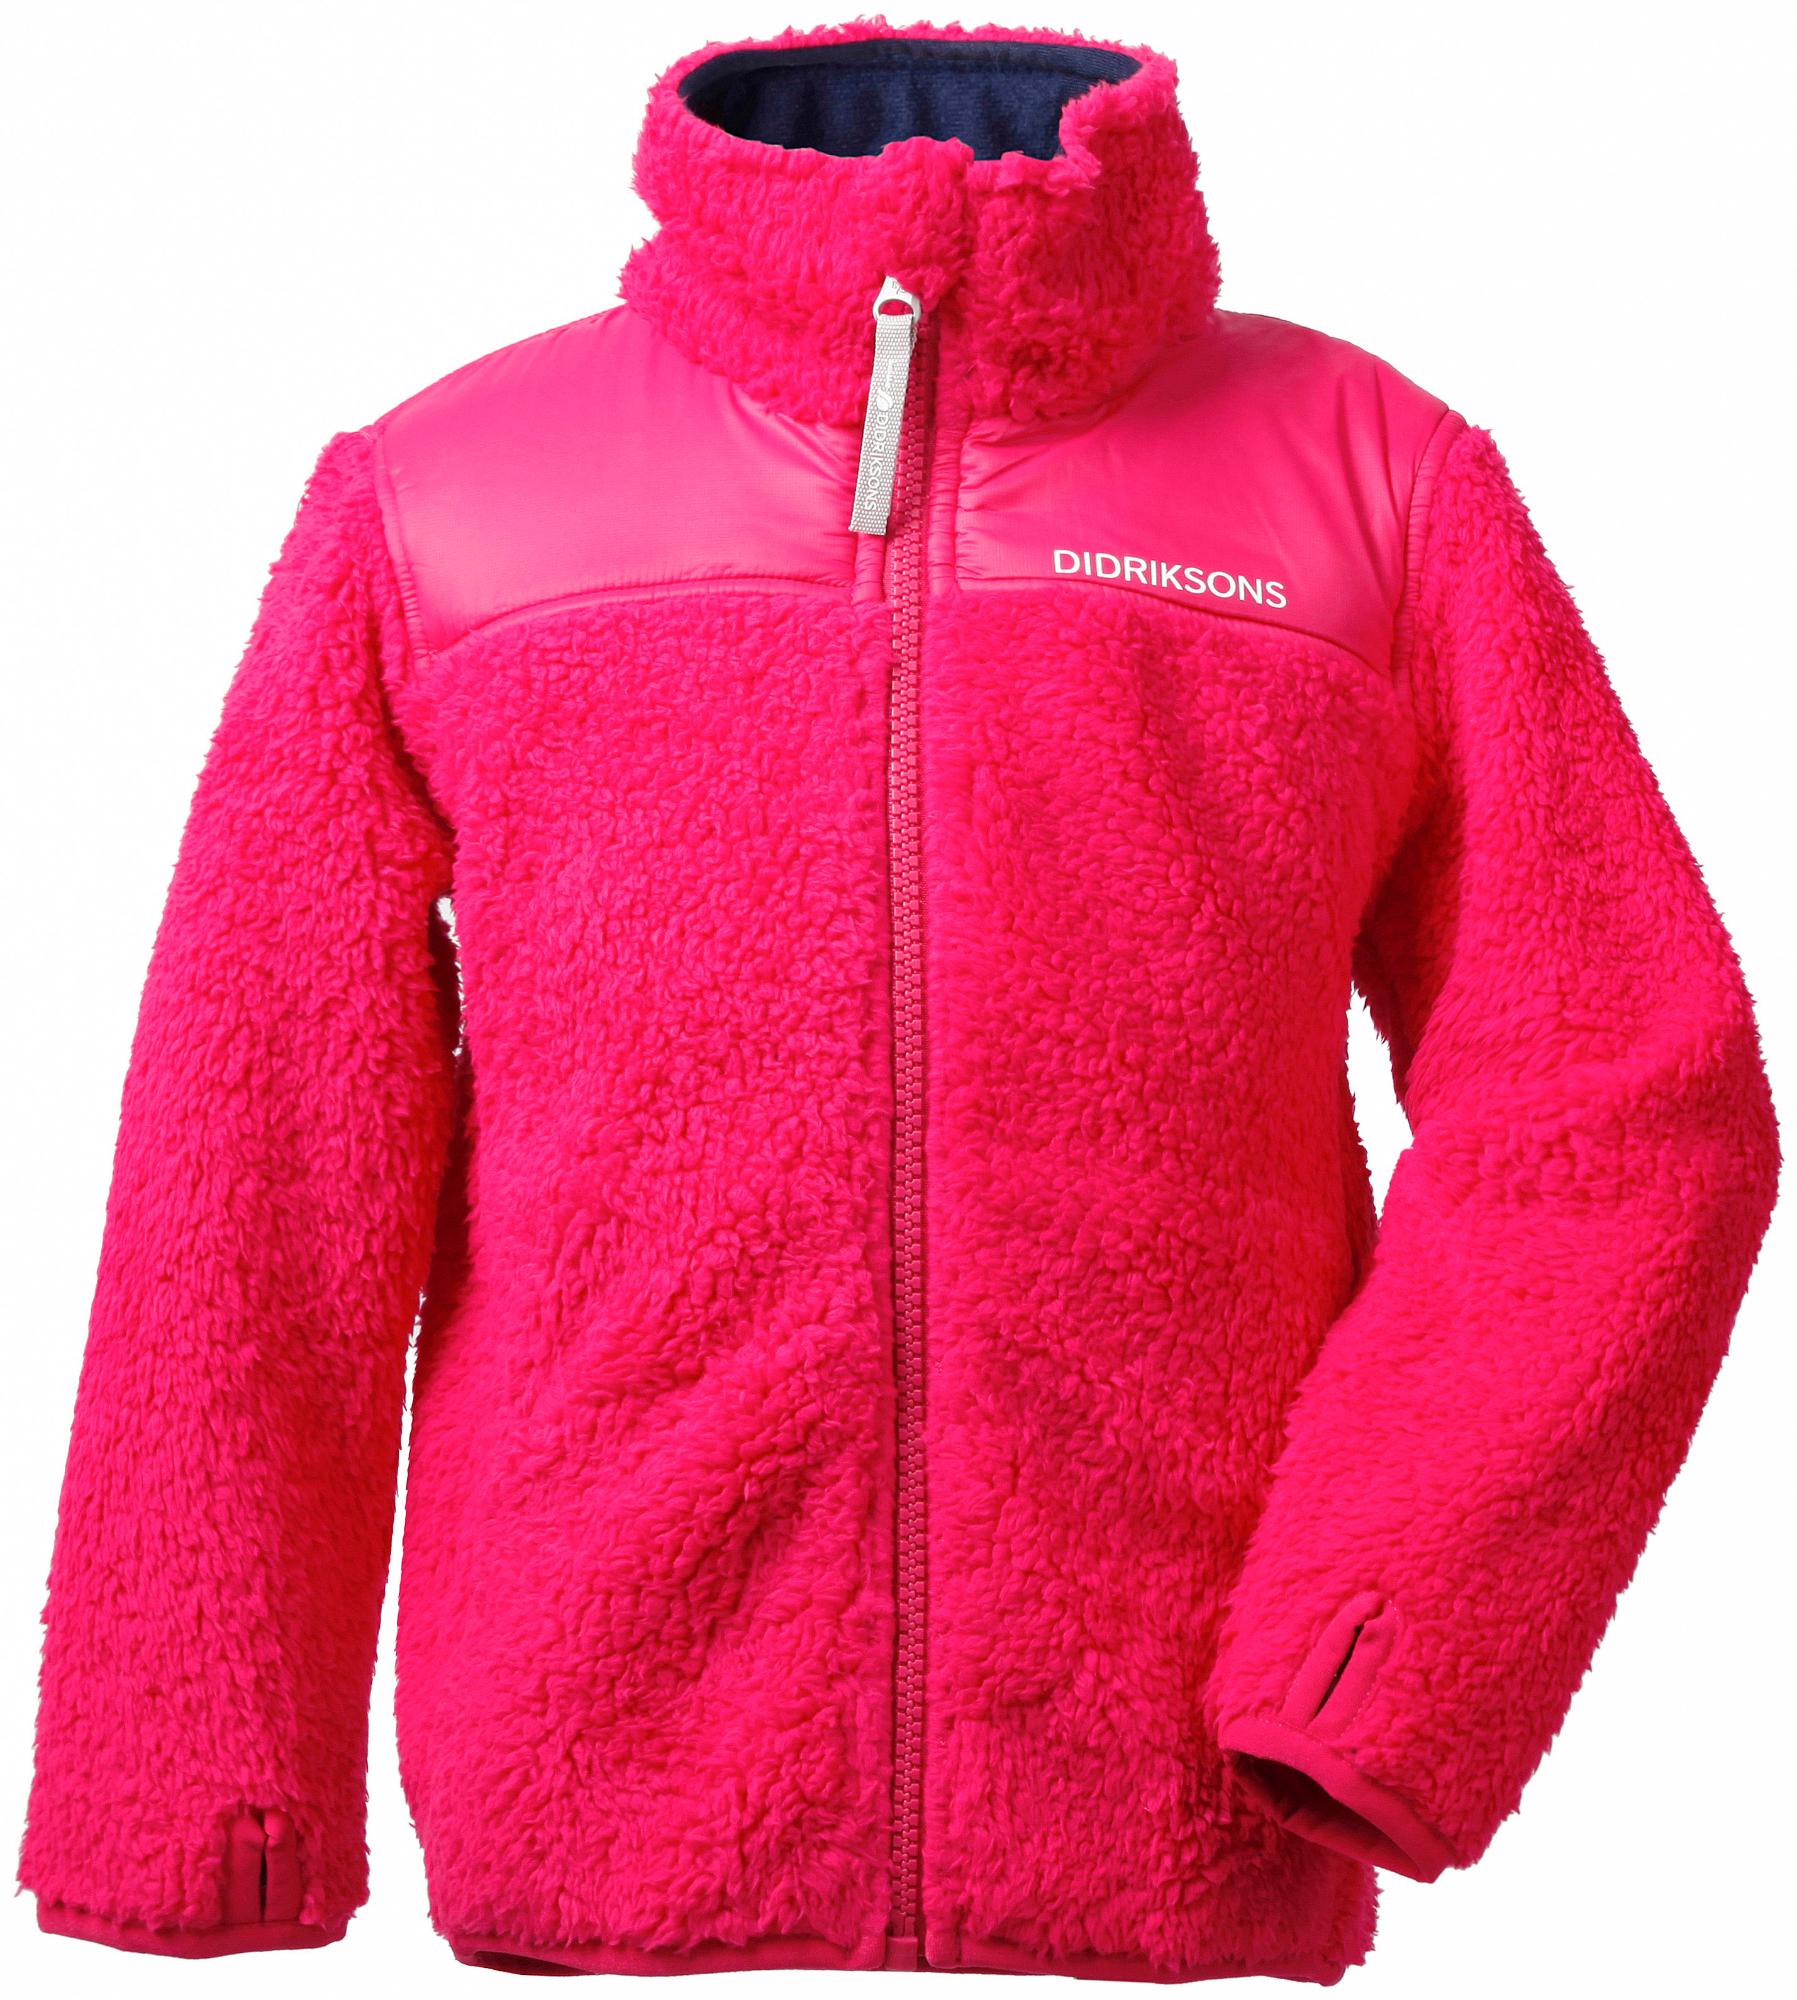 Didriksons Geite Kids Pile Jacket - Fleecejakke Børn - Pink | Jackets